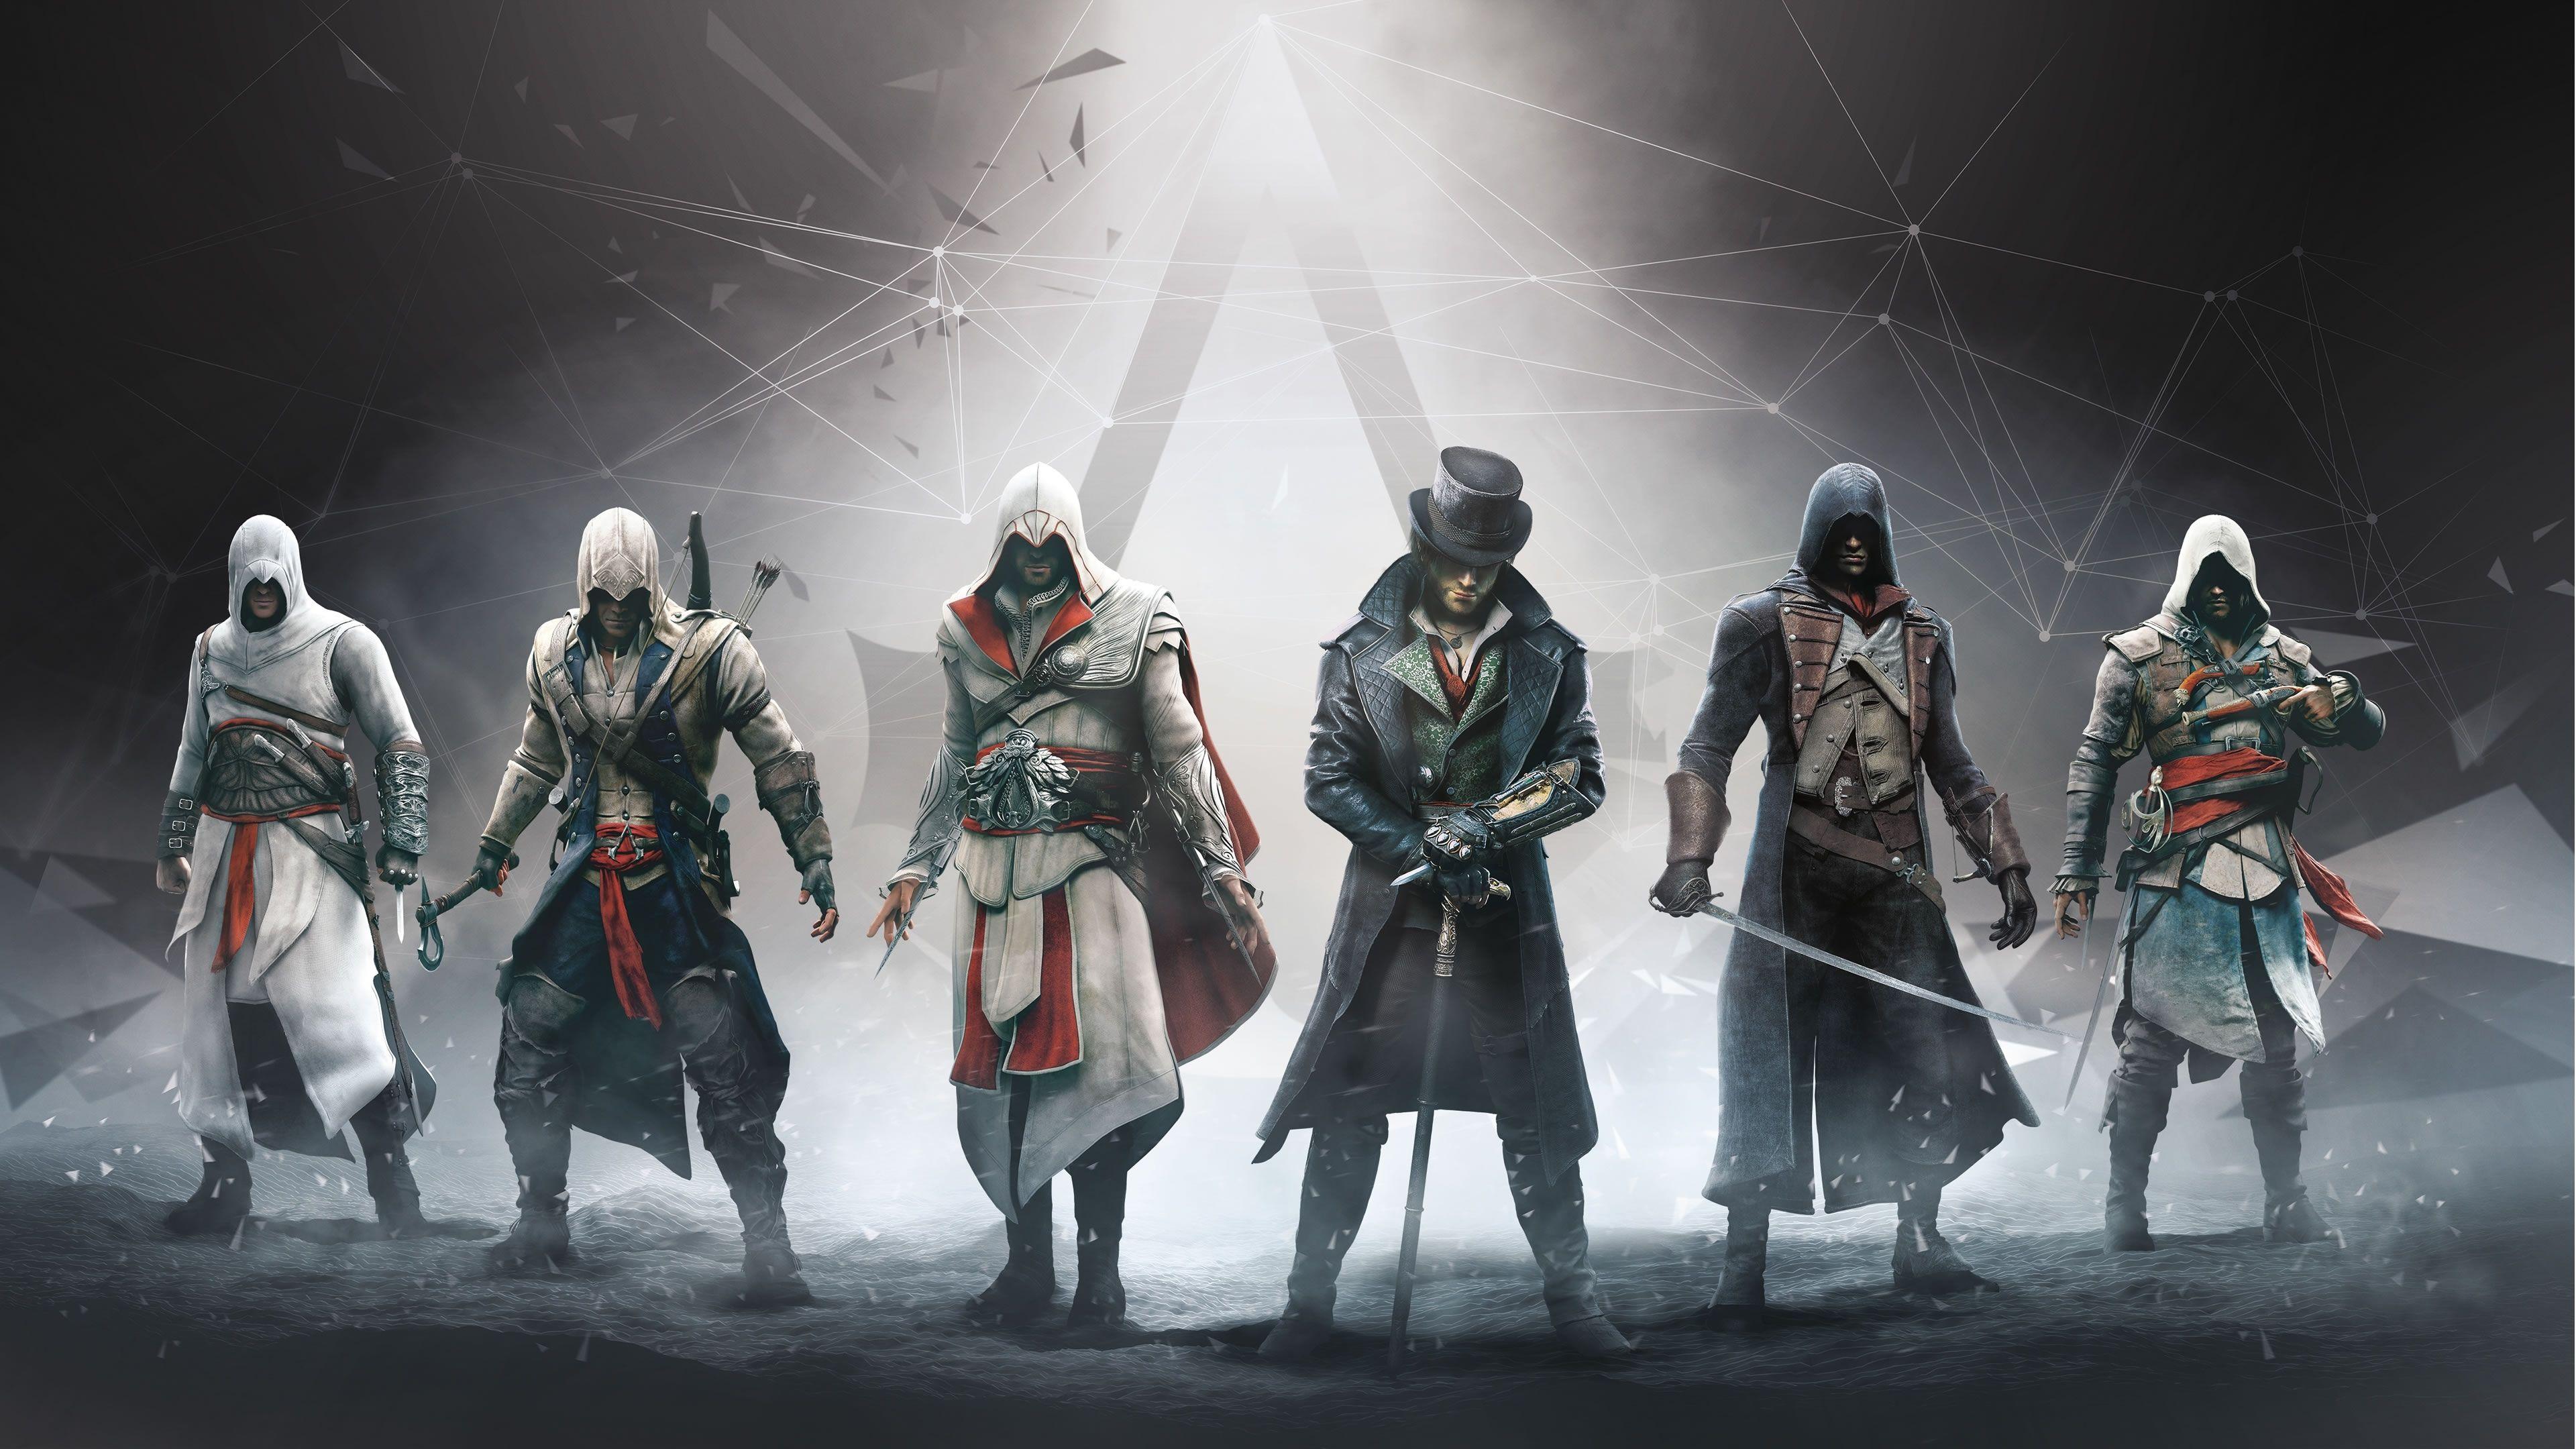 10 Best Assassin Creed Wallpaper All Assassins Full Hd 1080p For